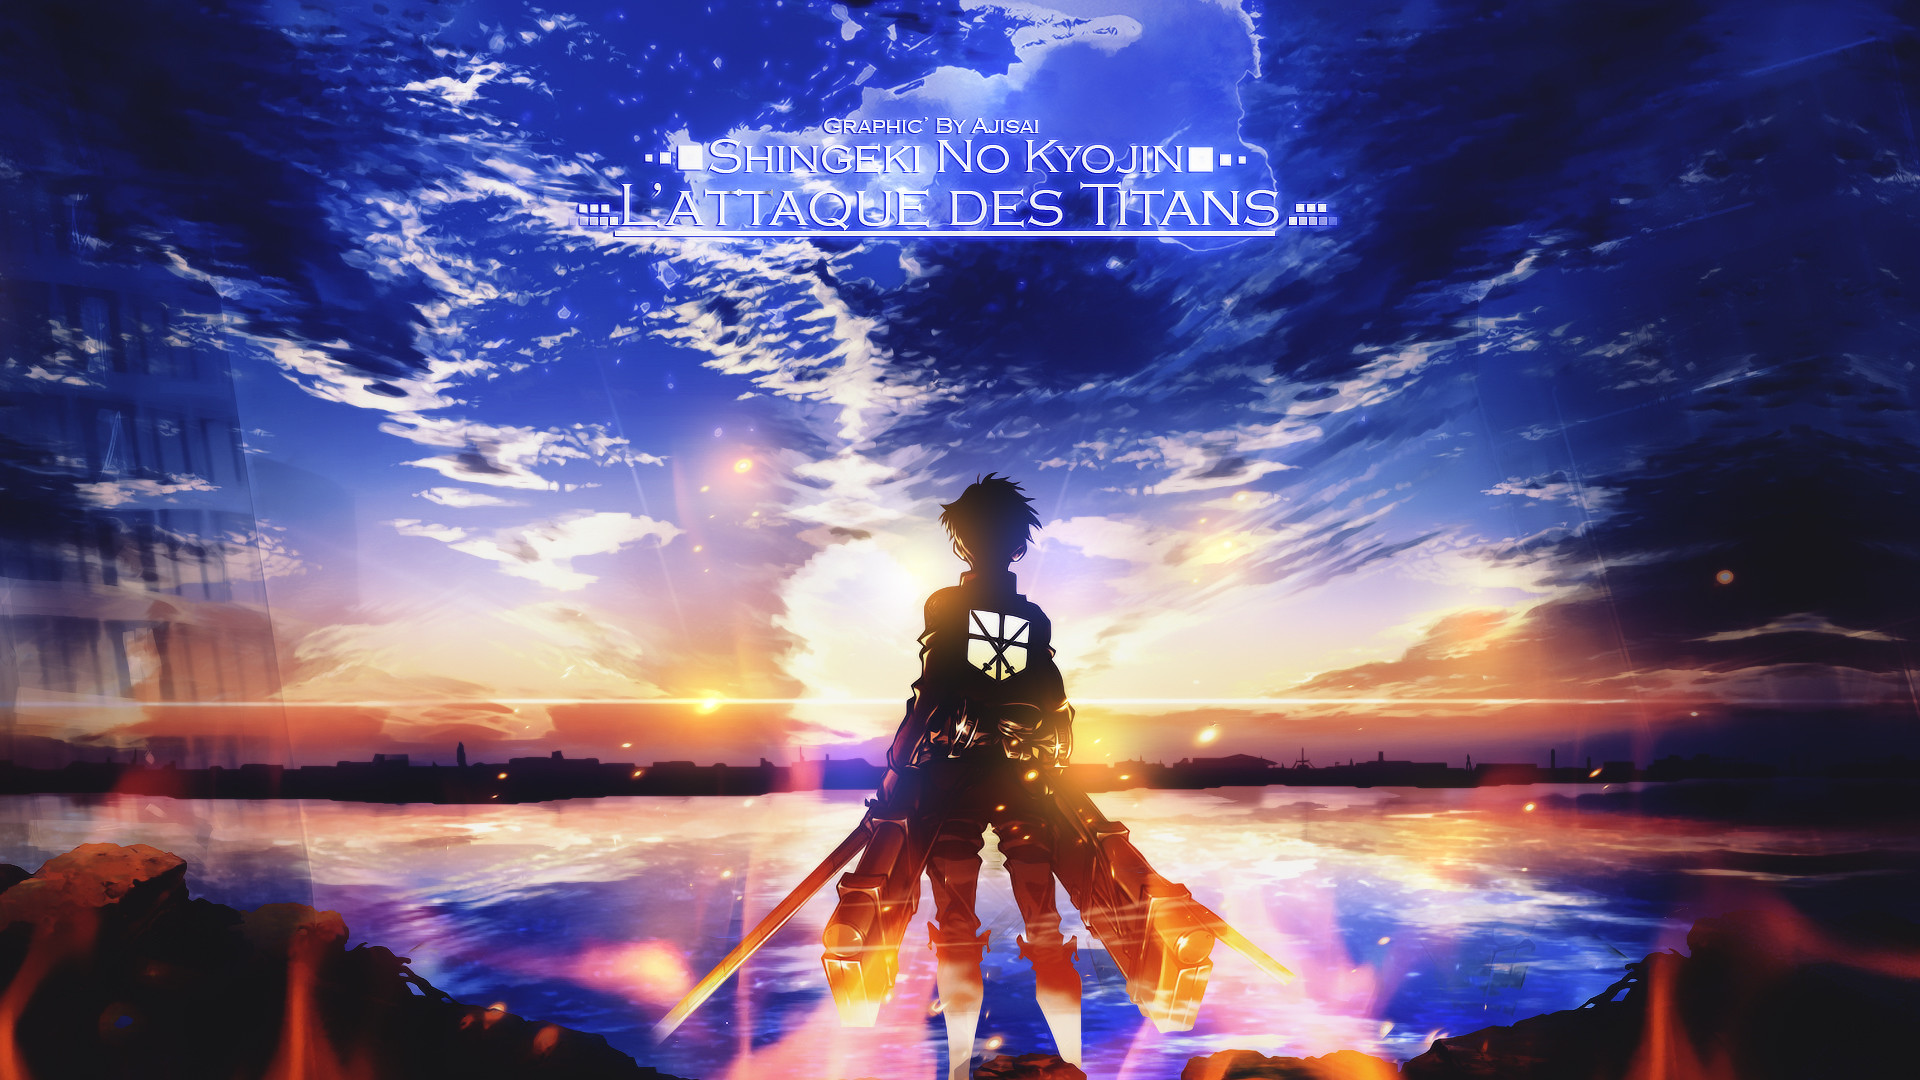 Tags: Anime, Attack on Titan, Eren Jaeger, HD Wallpaper, Facebook Cover